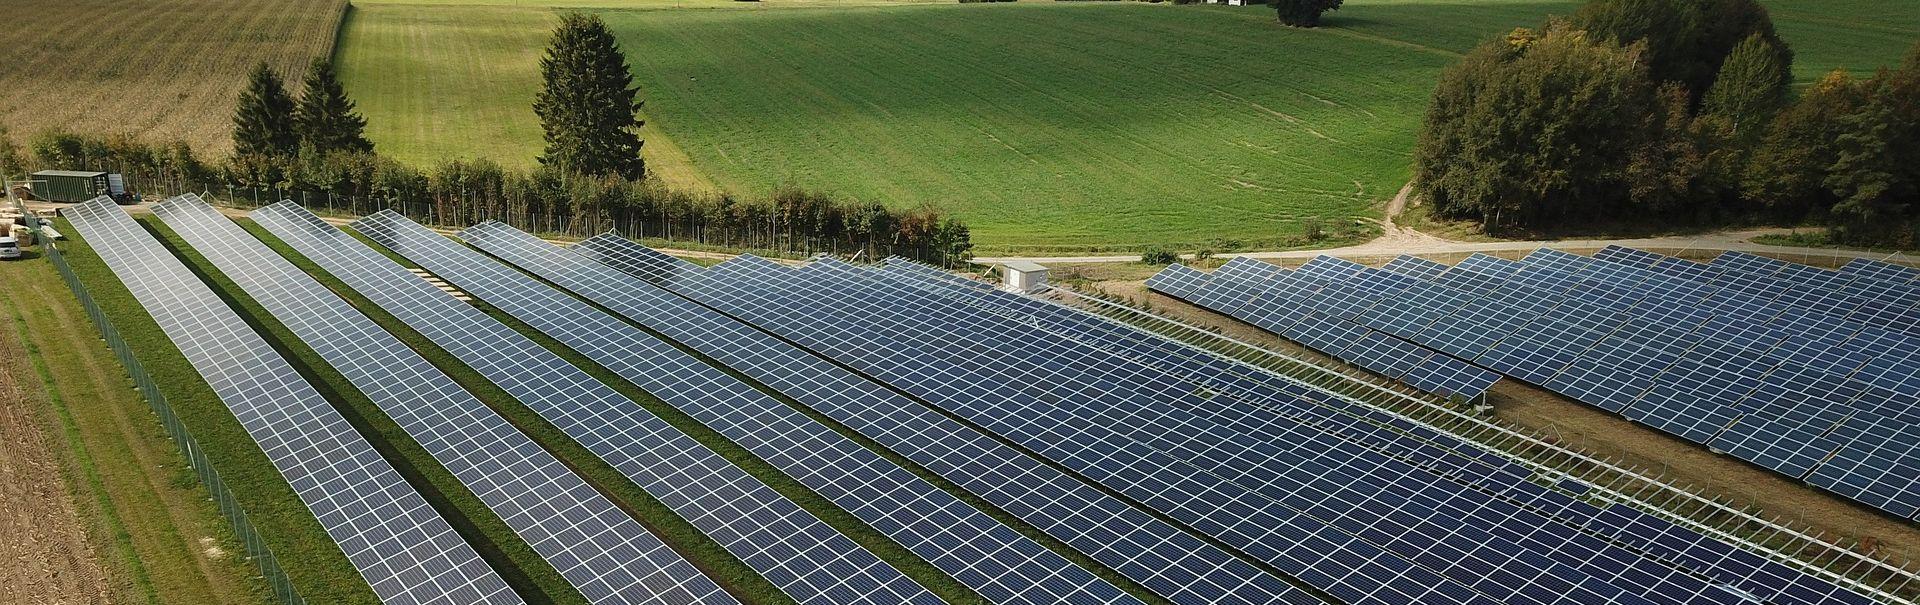 AleaSoft - Planta fotovoltaica paneles